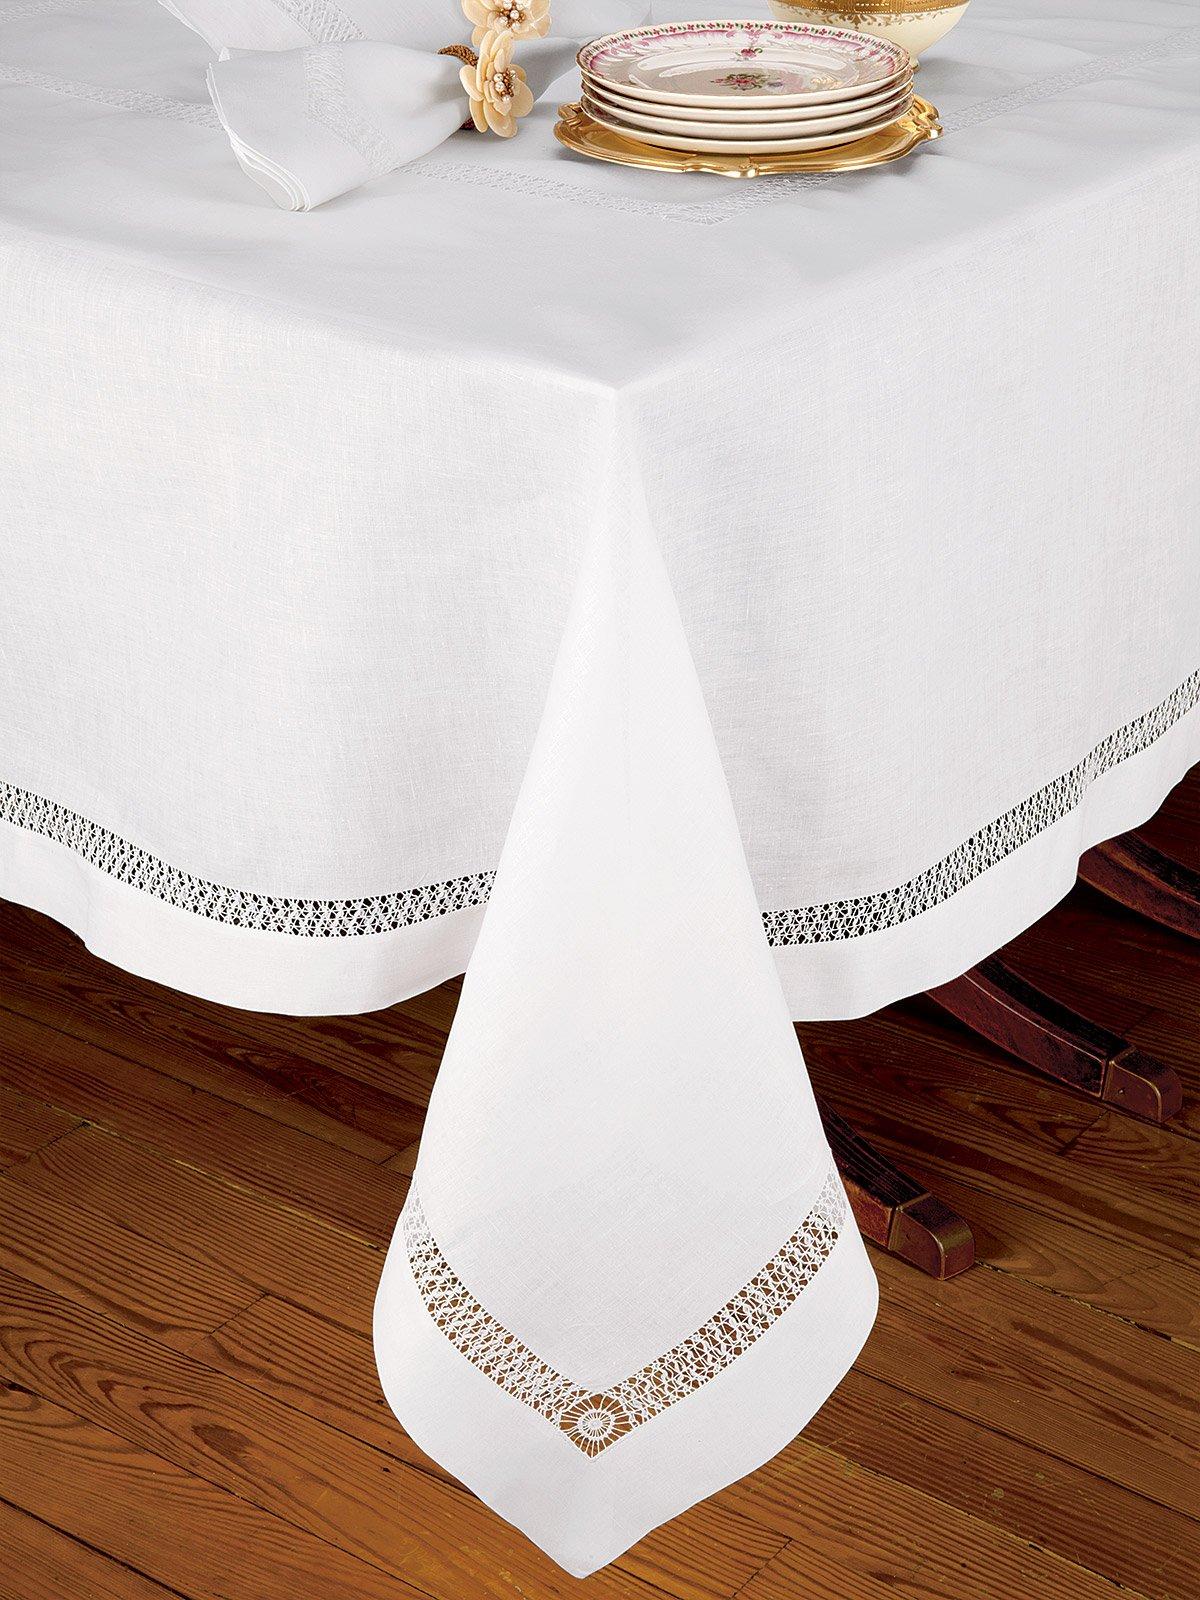 Chateau Blanc Table Cloth Fine Table Linens Schweitzer Linen